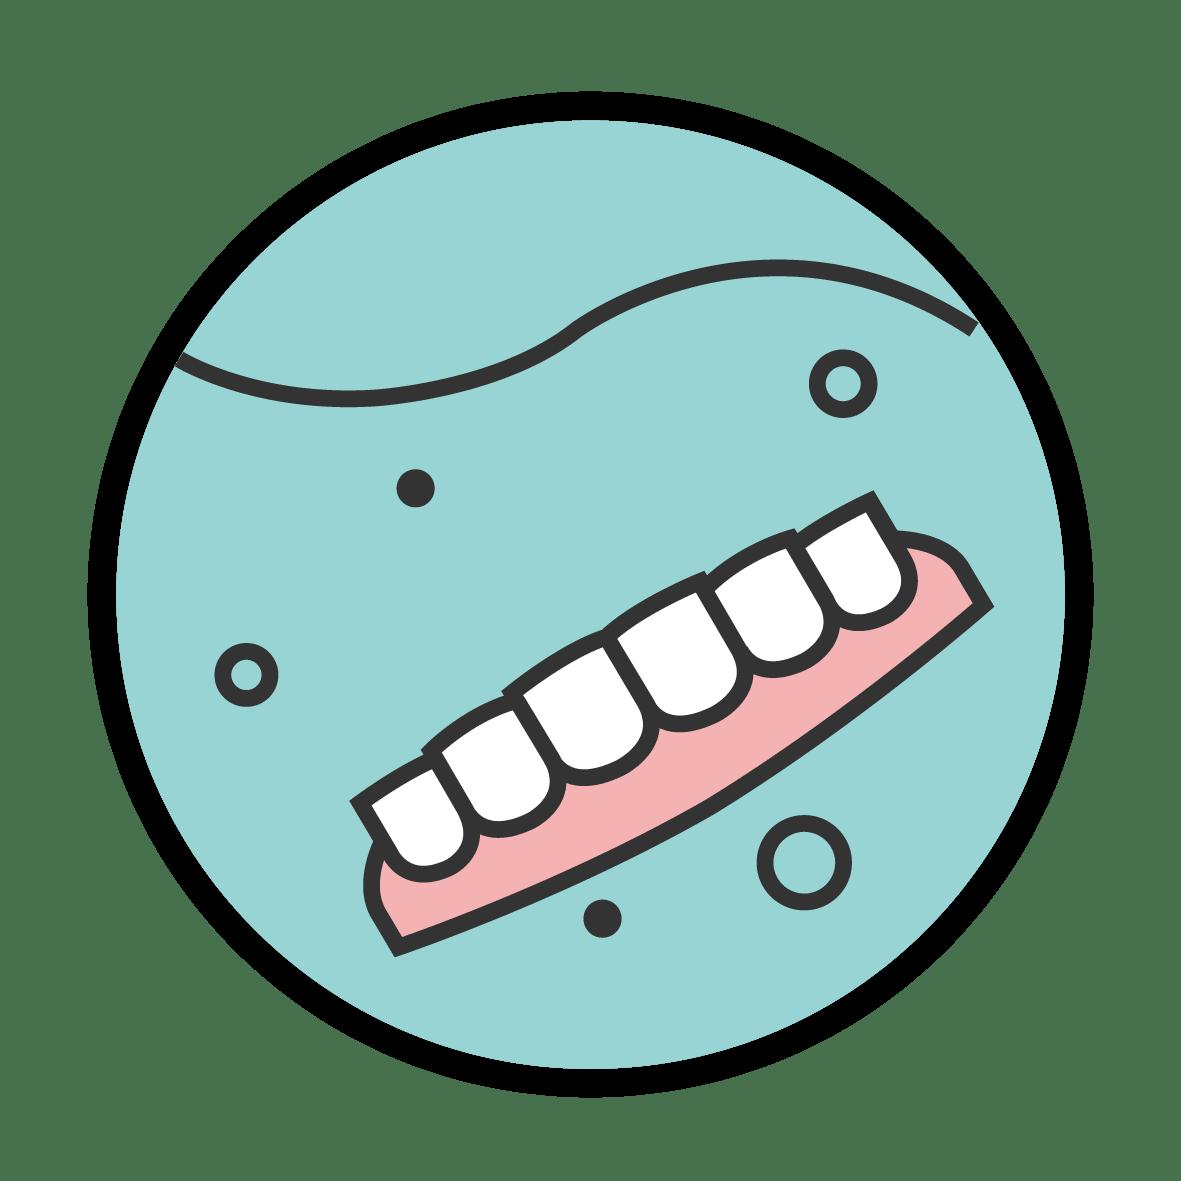 Renewed Smiles • Renewed Health - Ranieu Family Dental